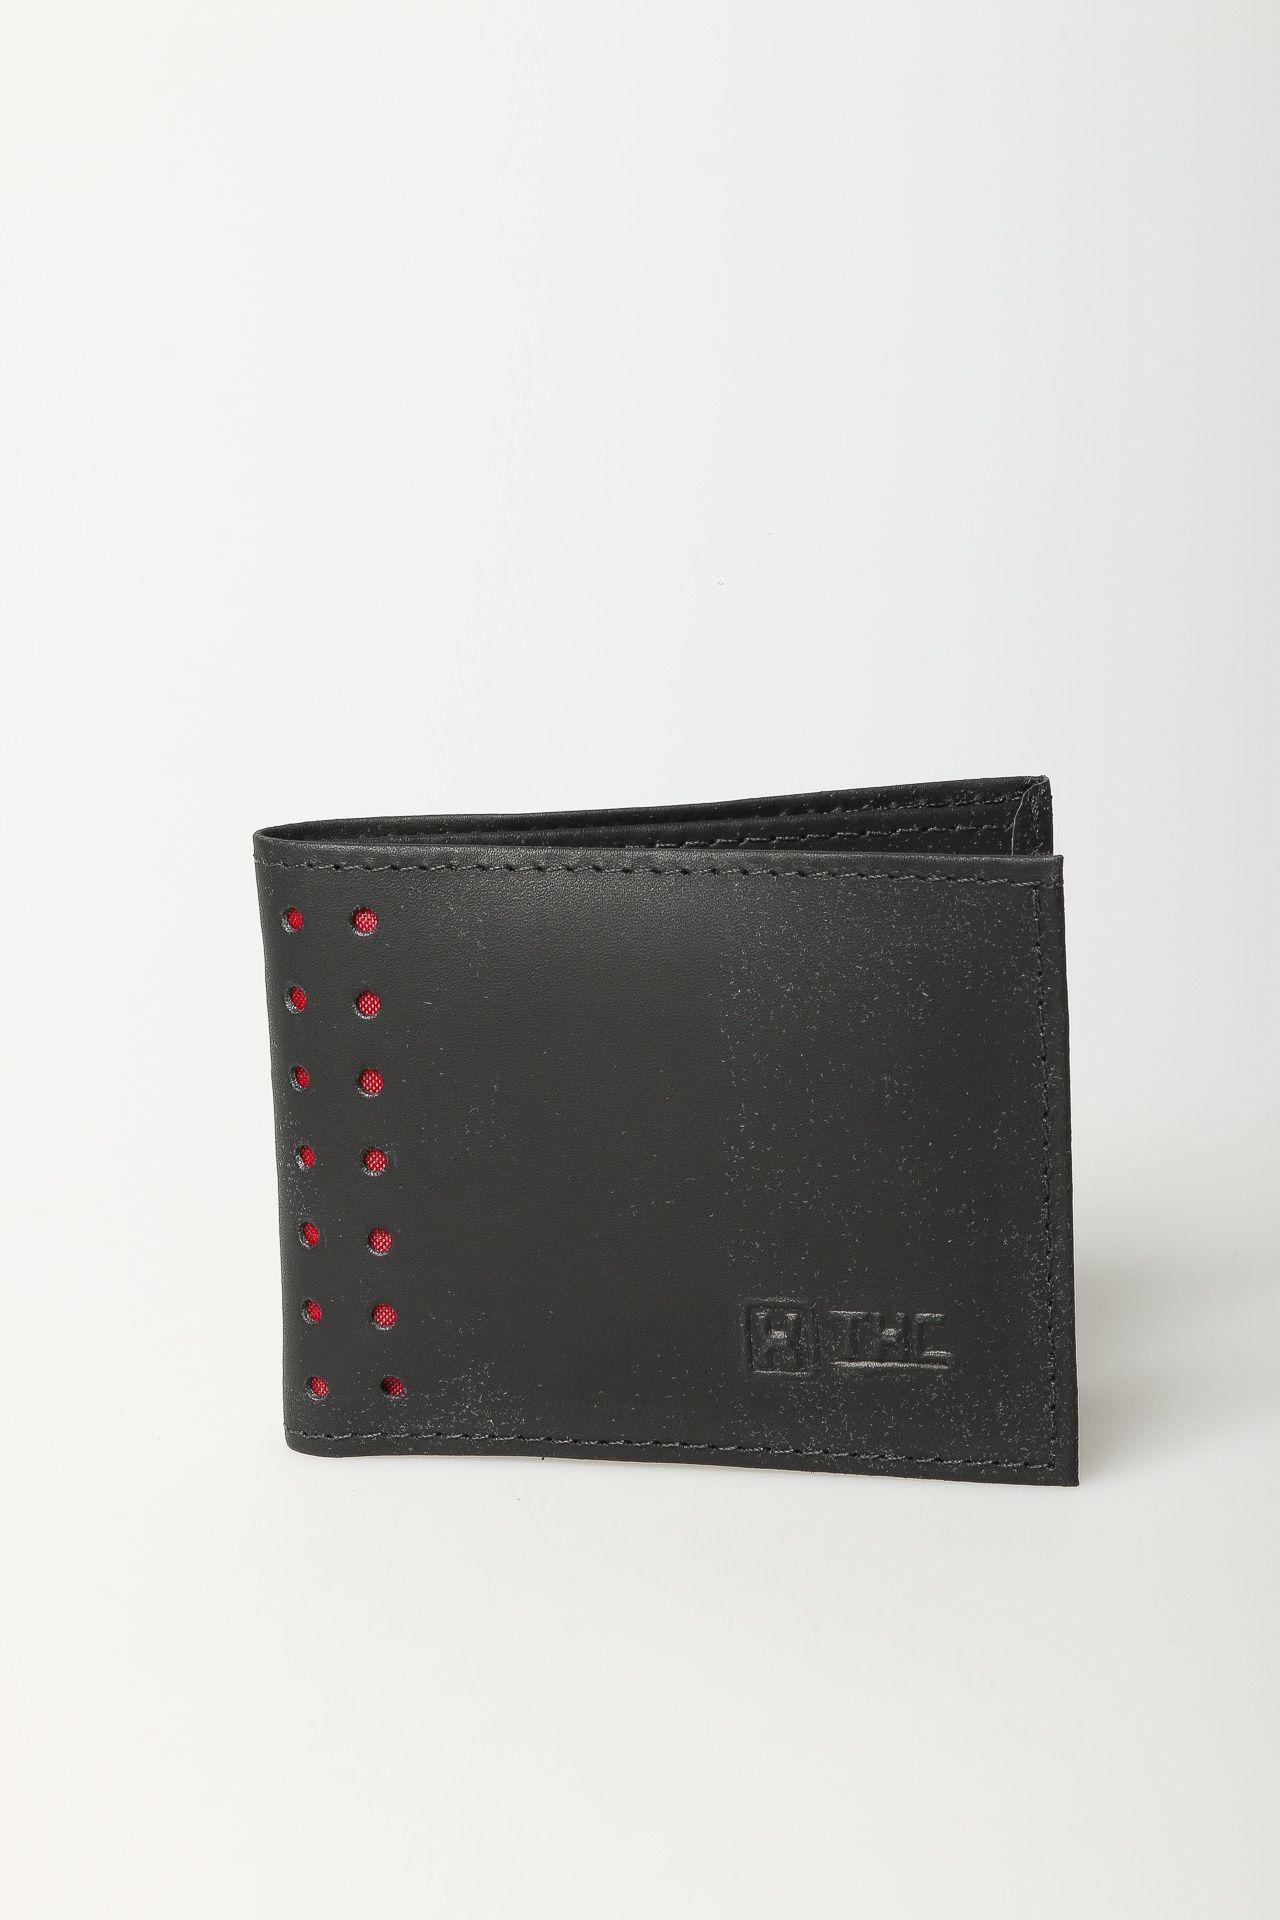 Carteira TXC 11001